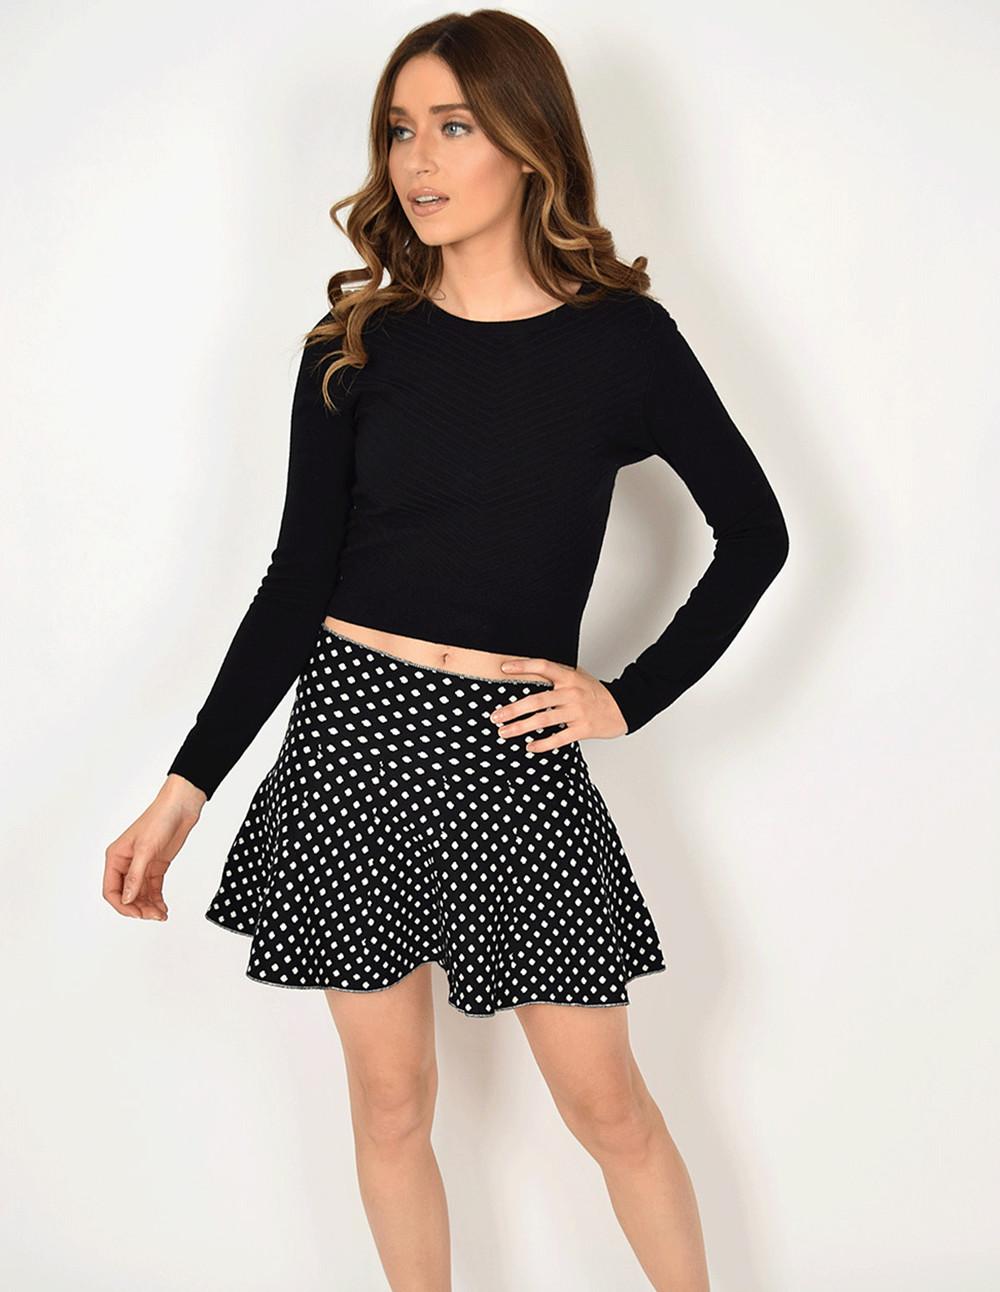 Blue Vanilla ROONEY - Ditsy Diamond A-Skirt in black